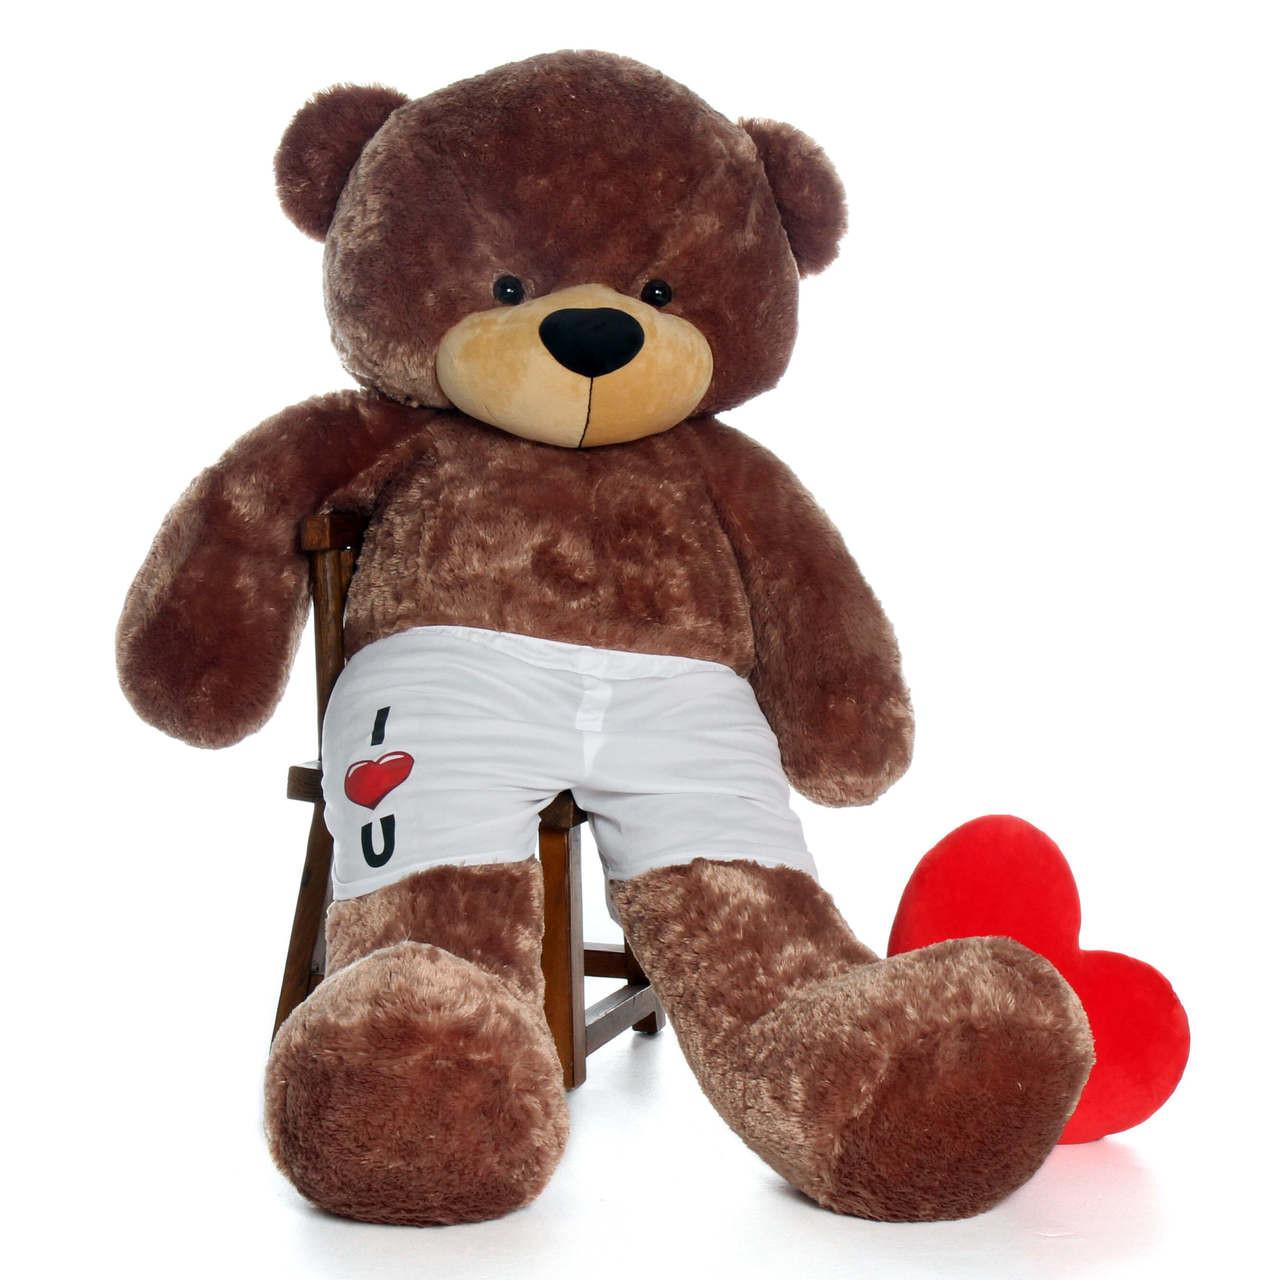 6ft Sunny Cuddles Giant Mocha Teddy Bear in I Heart U Boxers